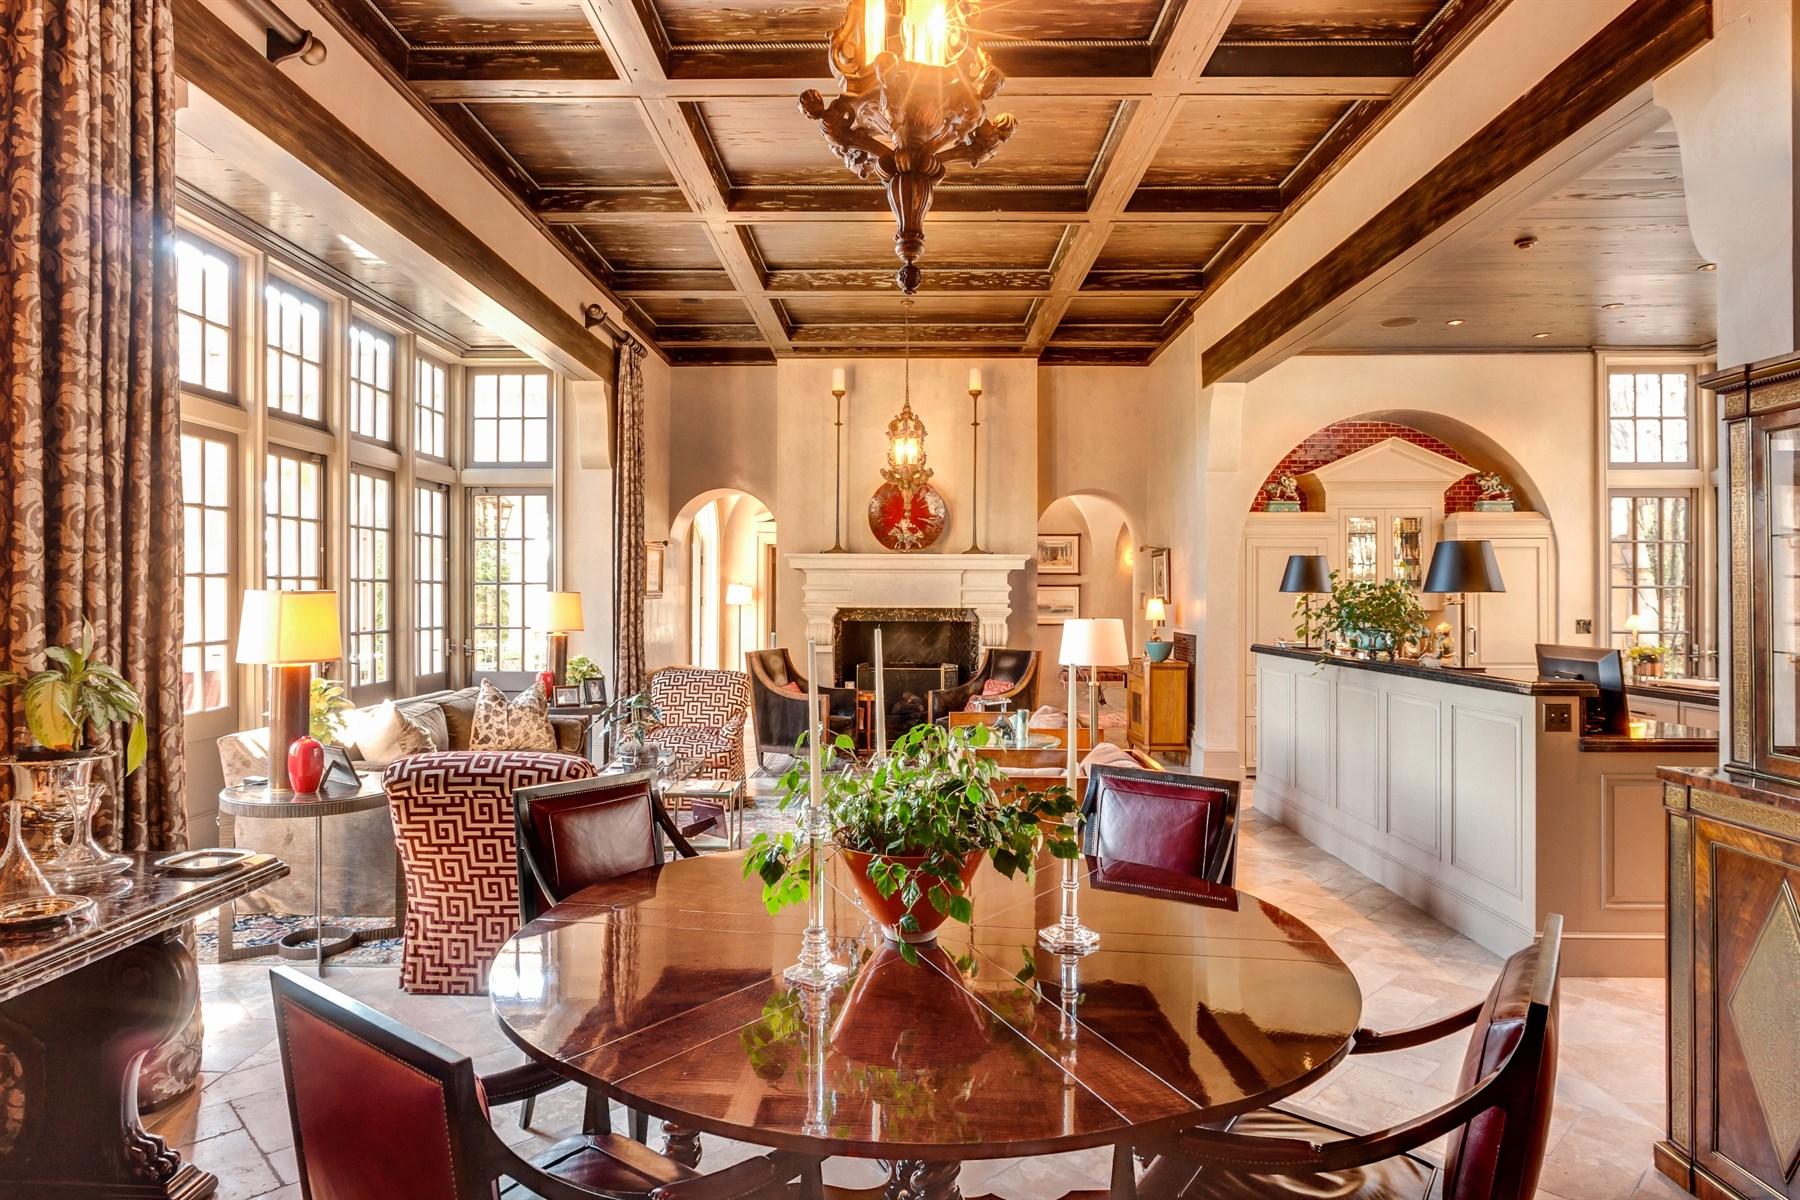 Additional photo for property listing at Villa Tuscan 109 Ledge Lane Chapel Hill, North Carolina 27514 United States